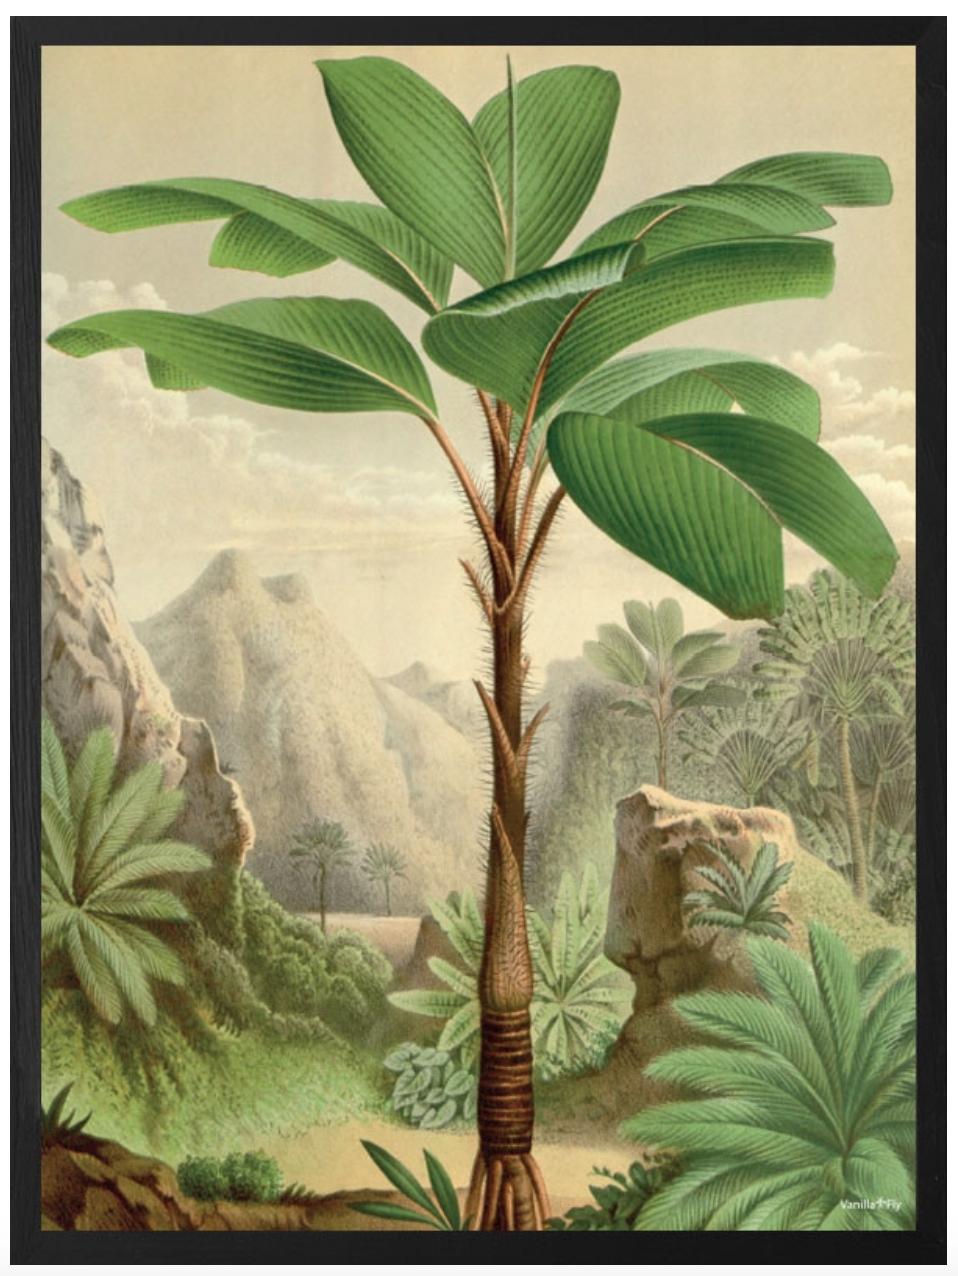 VanillaFly VanillaFly Poster Jungle 30x40